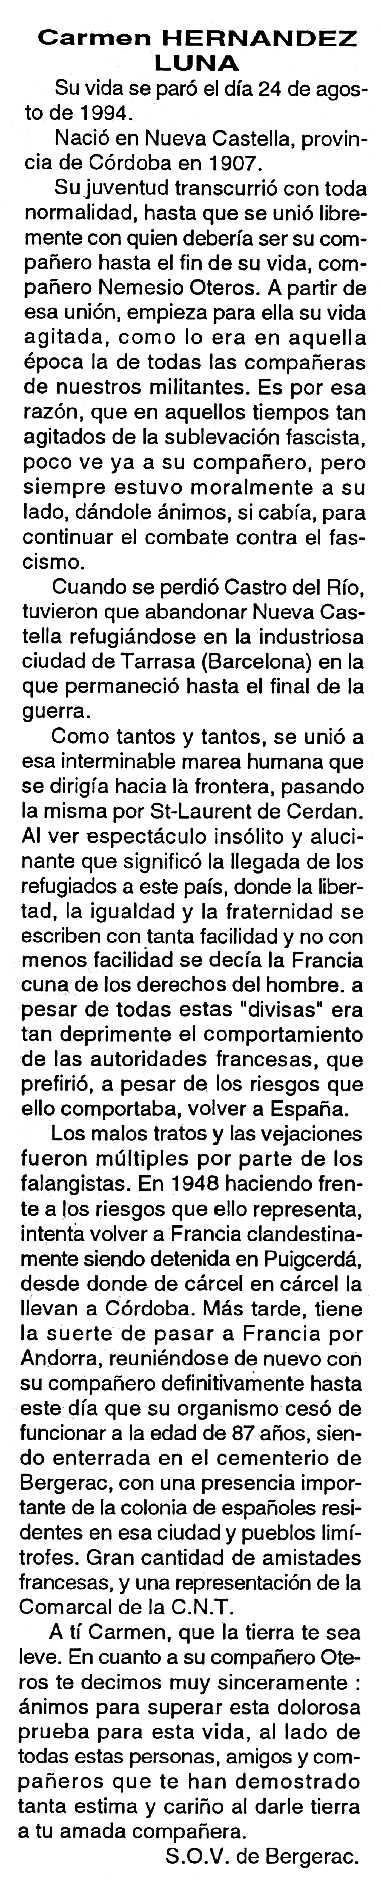 "Necrològica de Carmen Hernández Luna apareguda en el periòdic tolosà ""Cenit"" del 18 d'octubre de 1994"